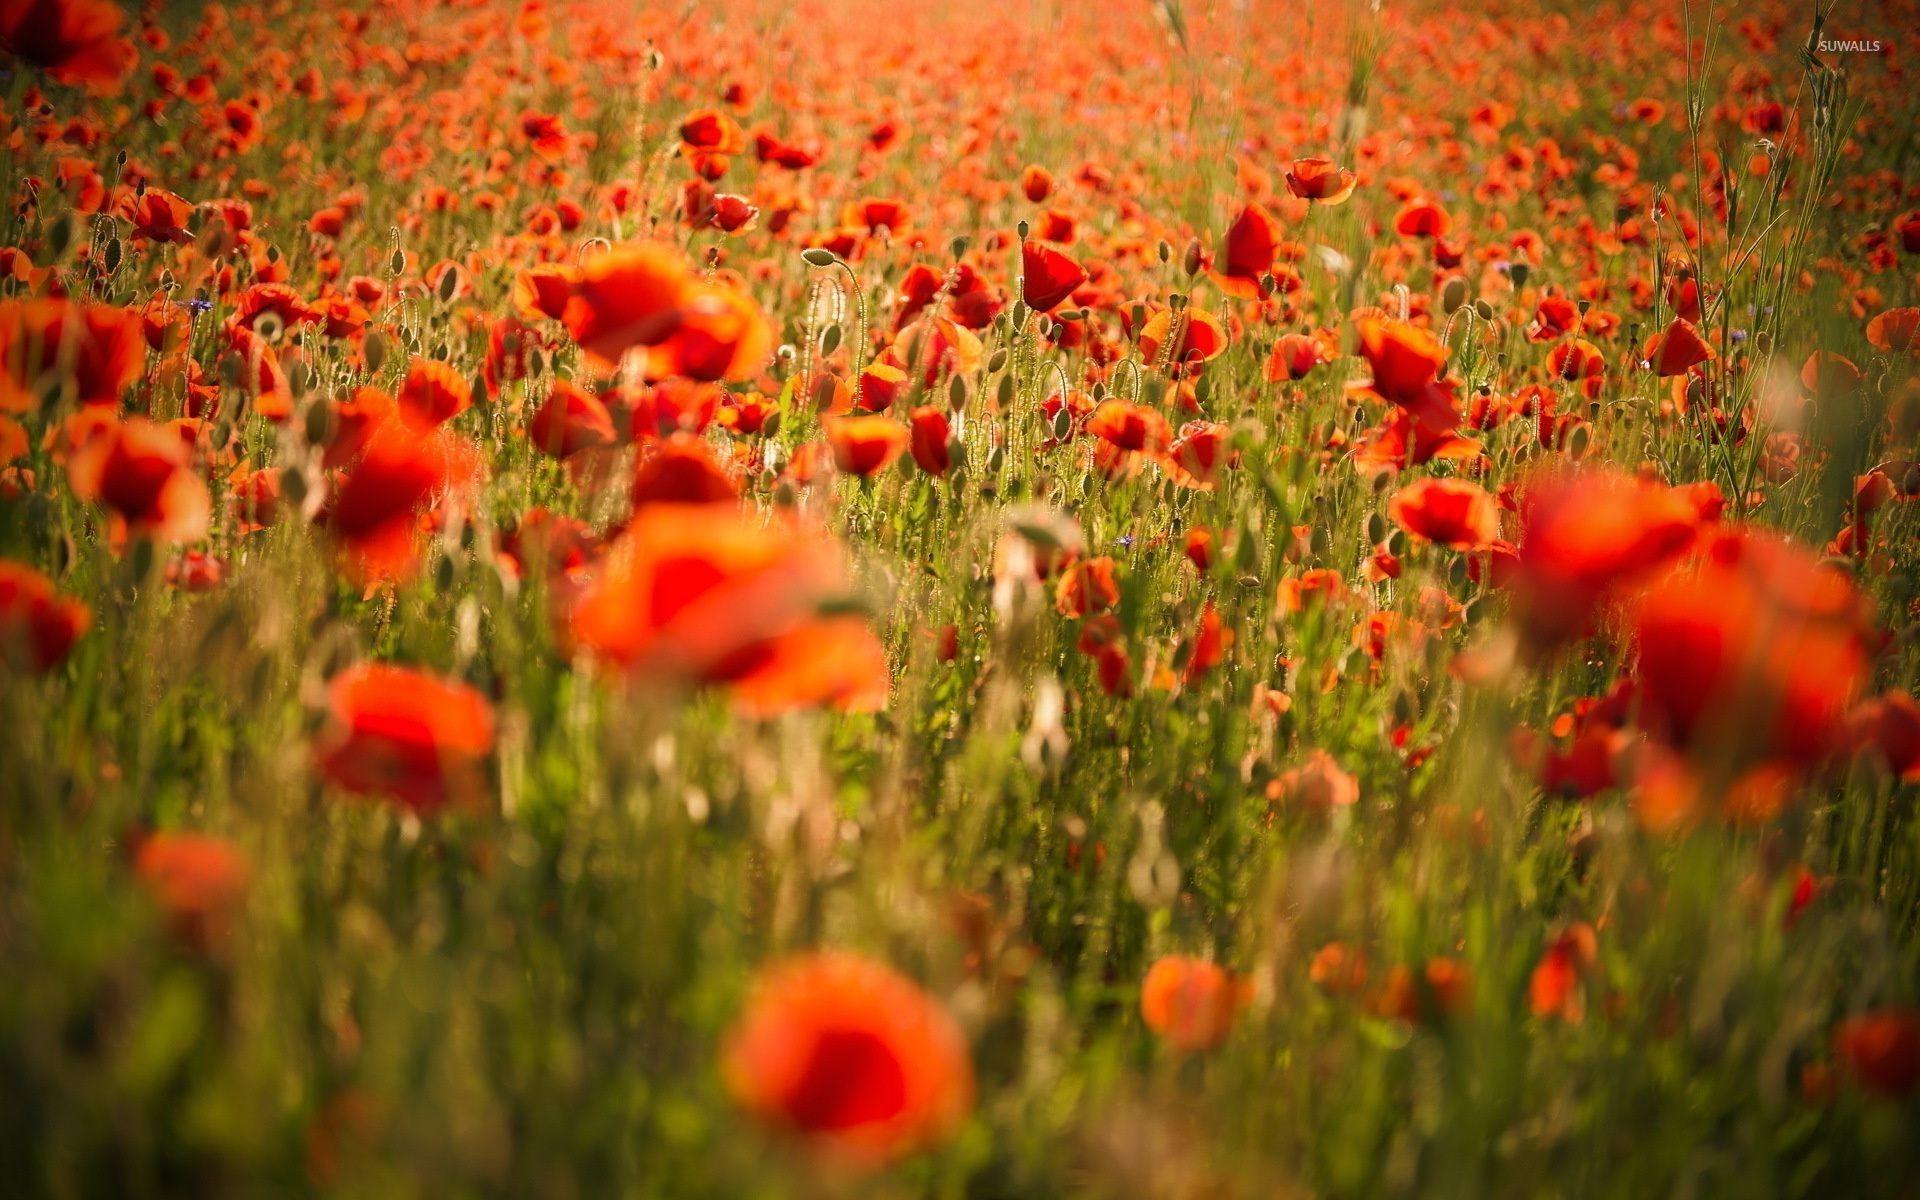 Red Poppy Wallpaper (58+ images)